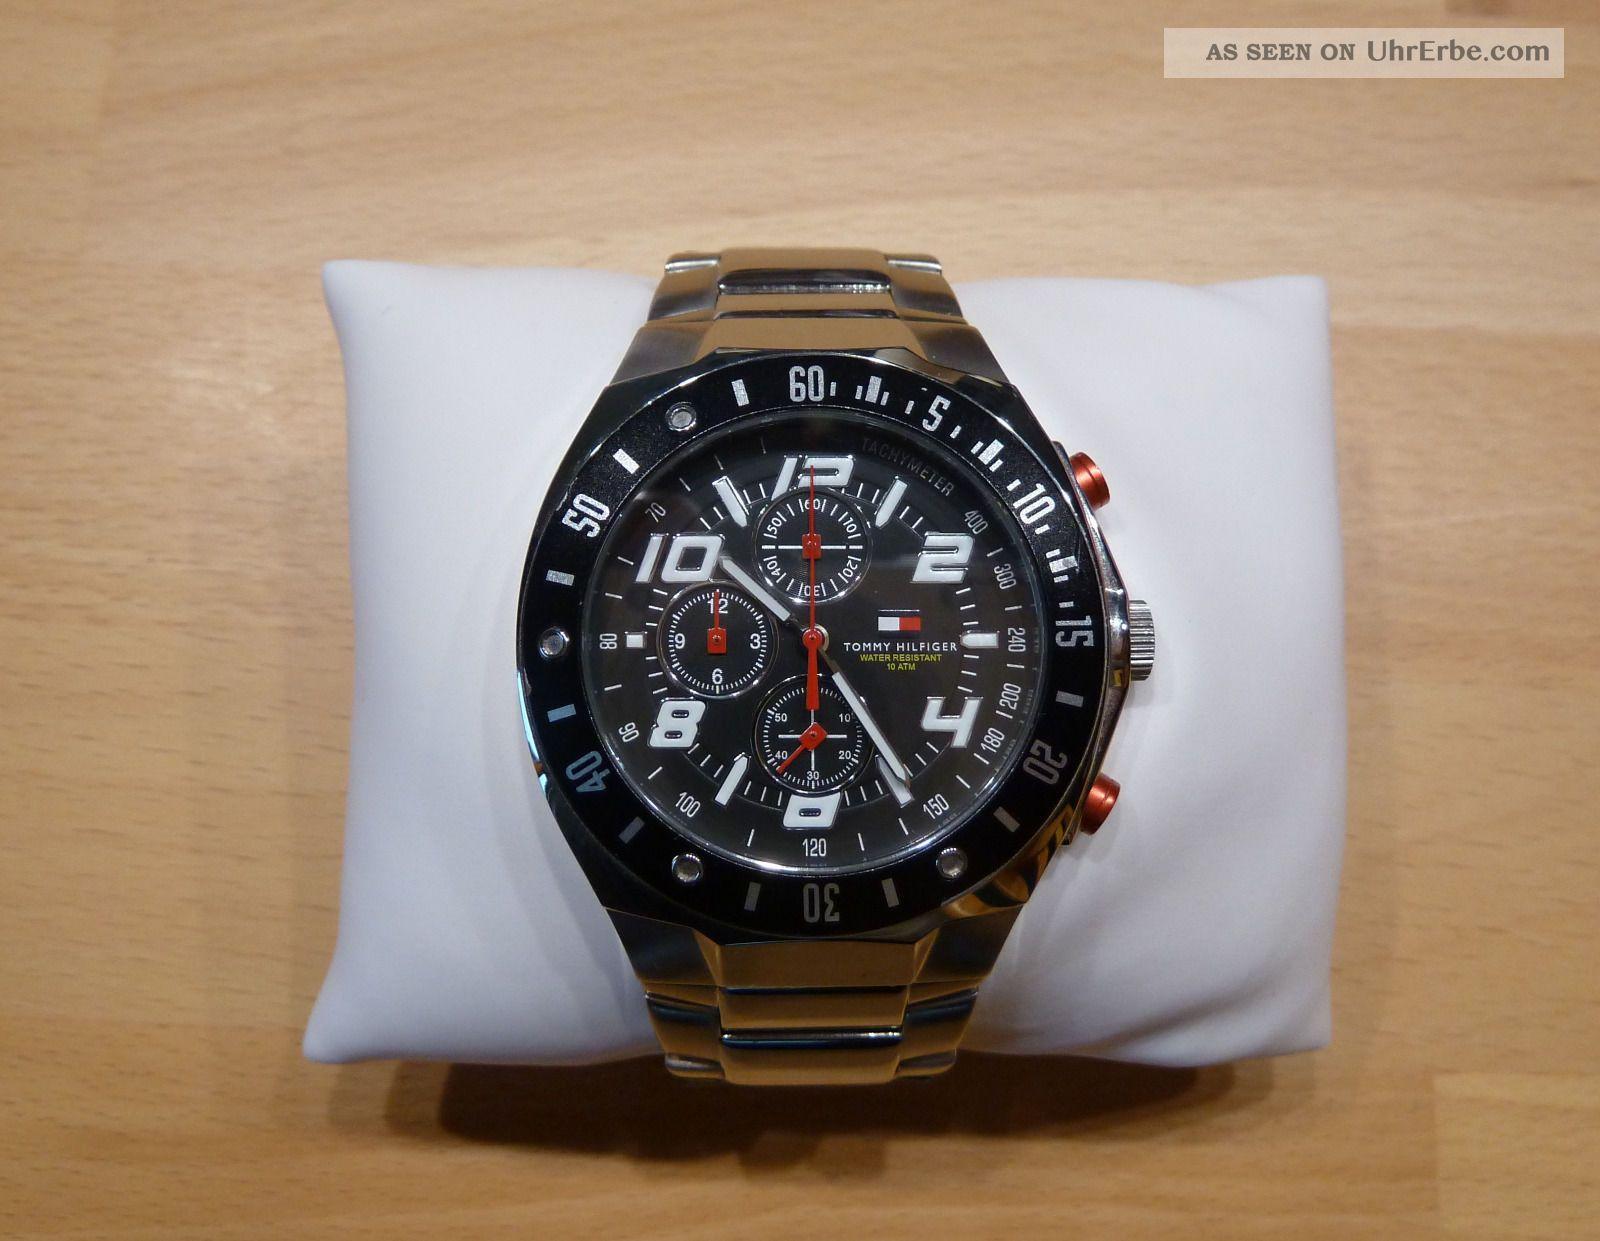 tommy hilfiger armbanduhr chronograph fliegeruhr uhr wasserdicht 100m. Black Bedroom Furniture Sets. Home Design Ideas